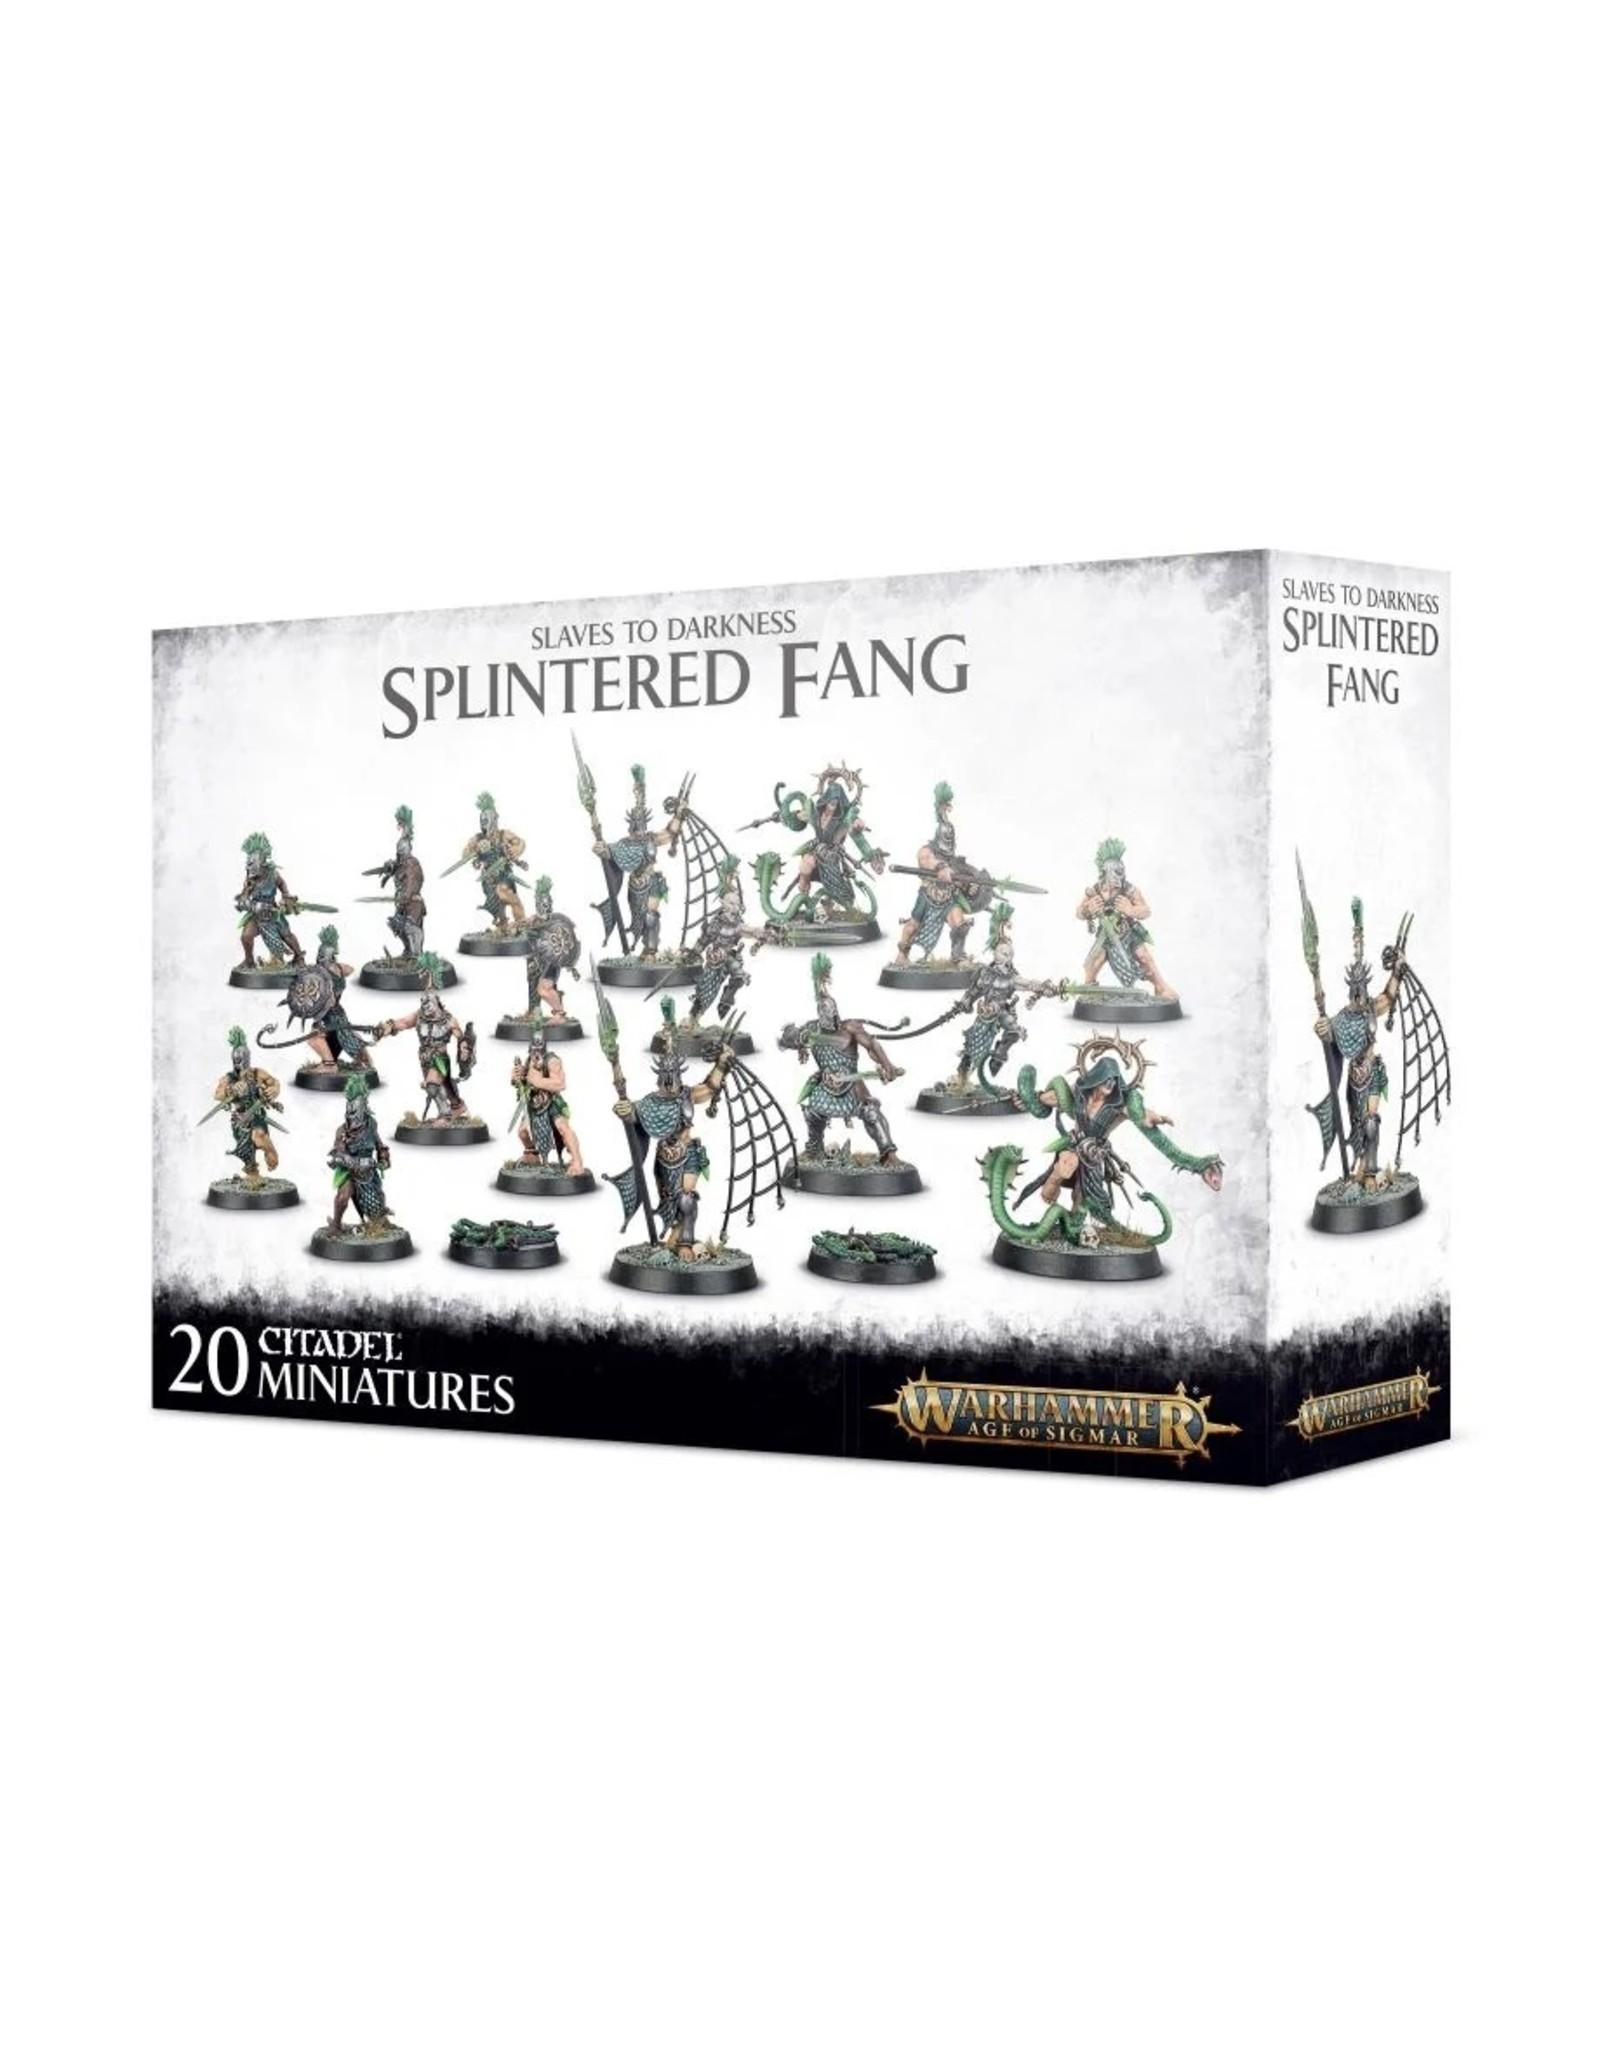 Games Workshop Slaves to Darkness: The Splintered Fang